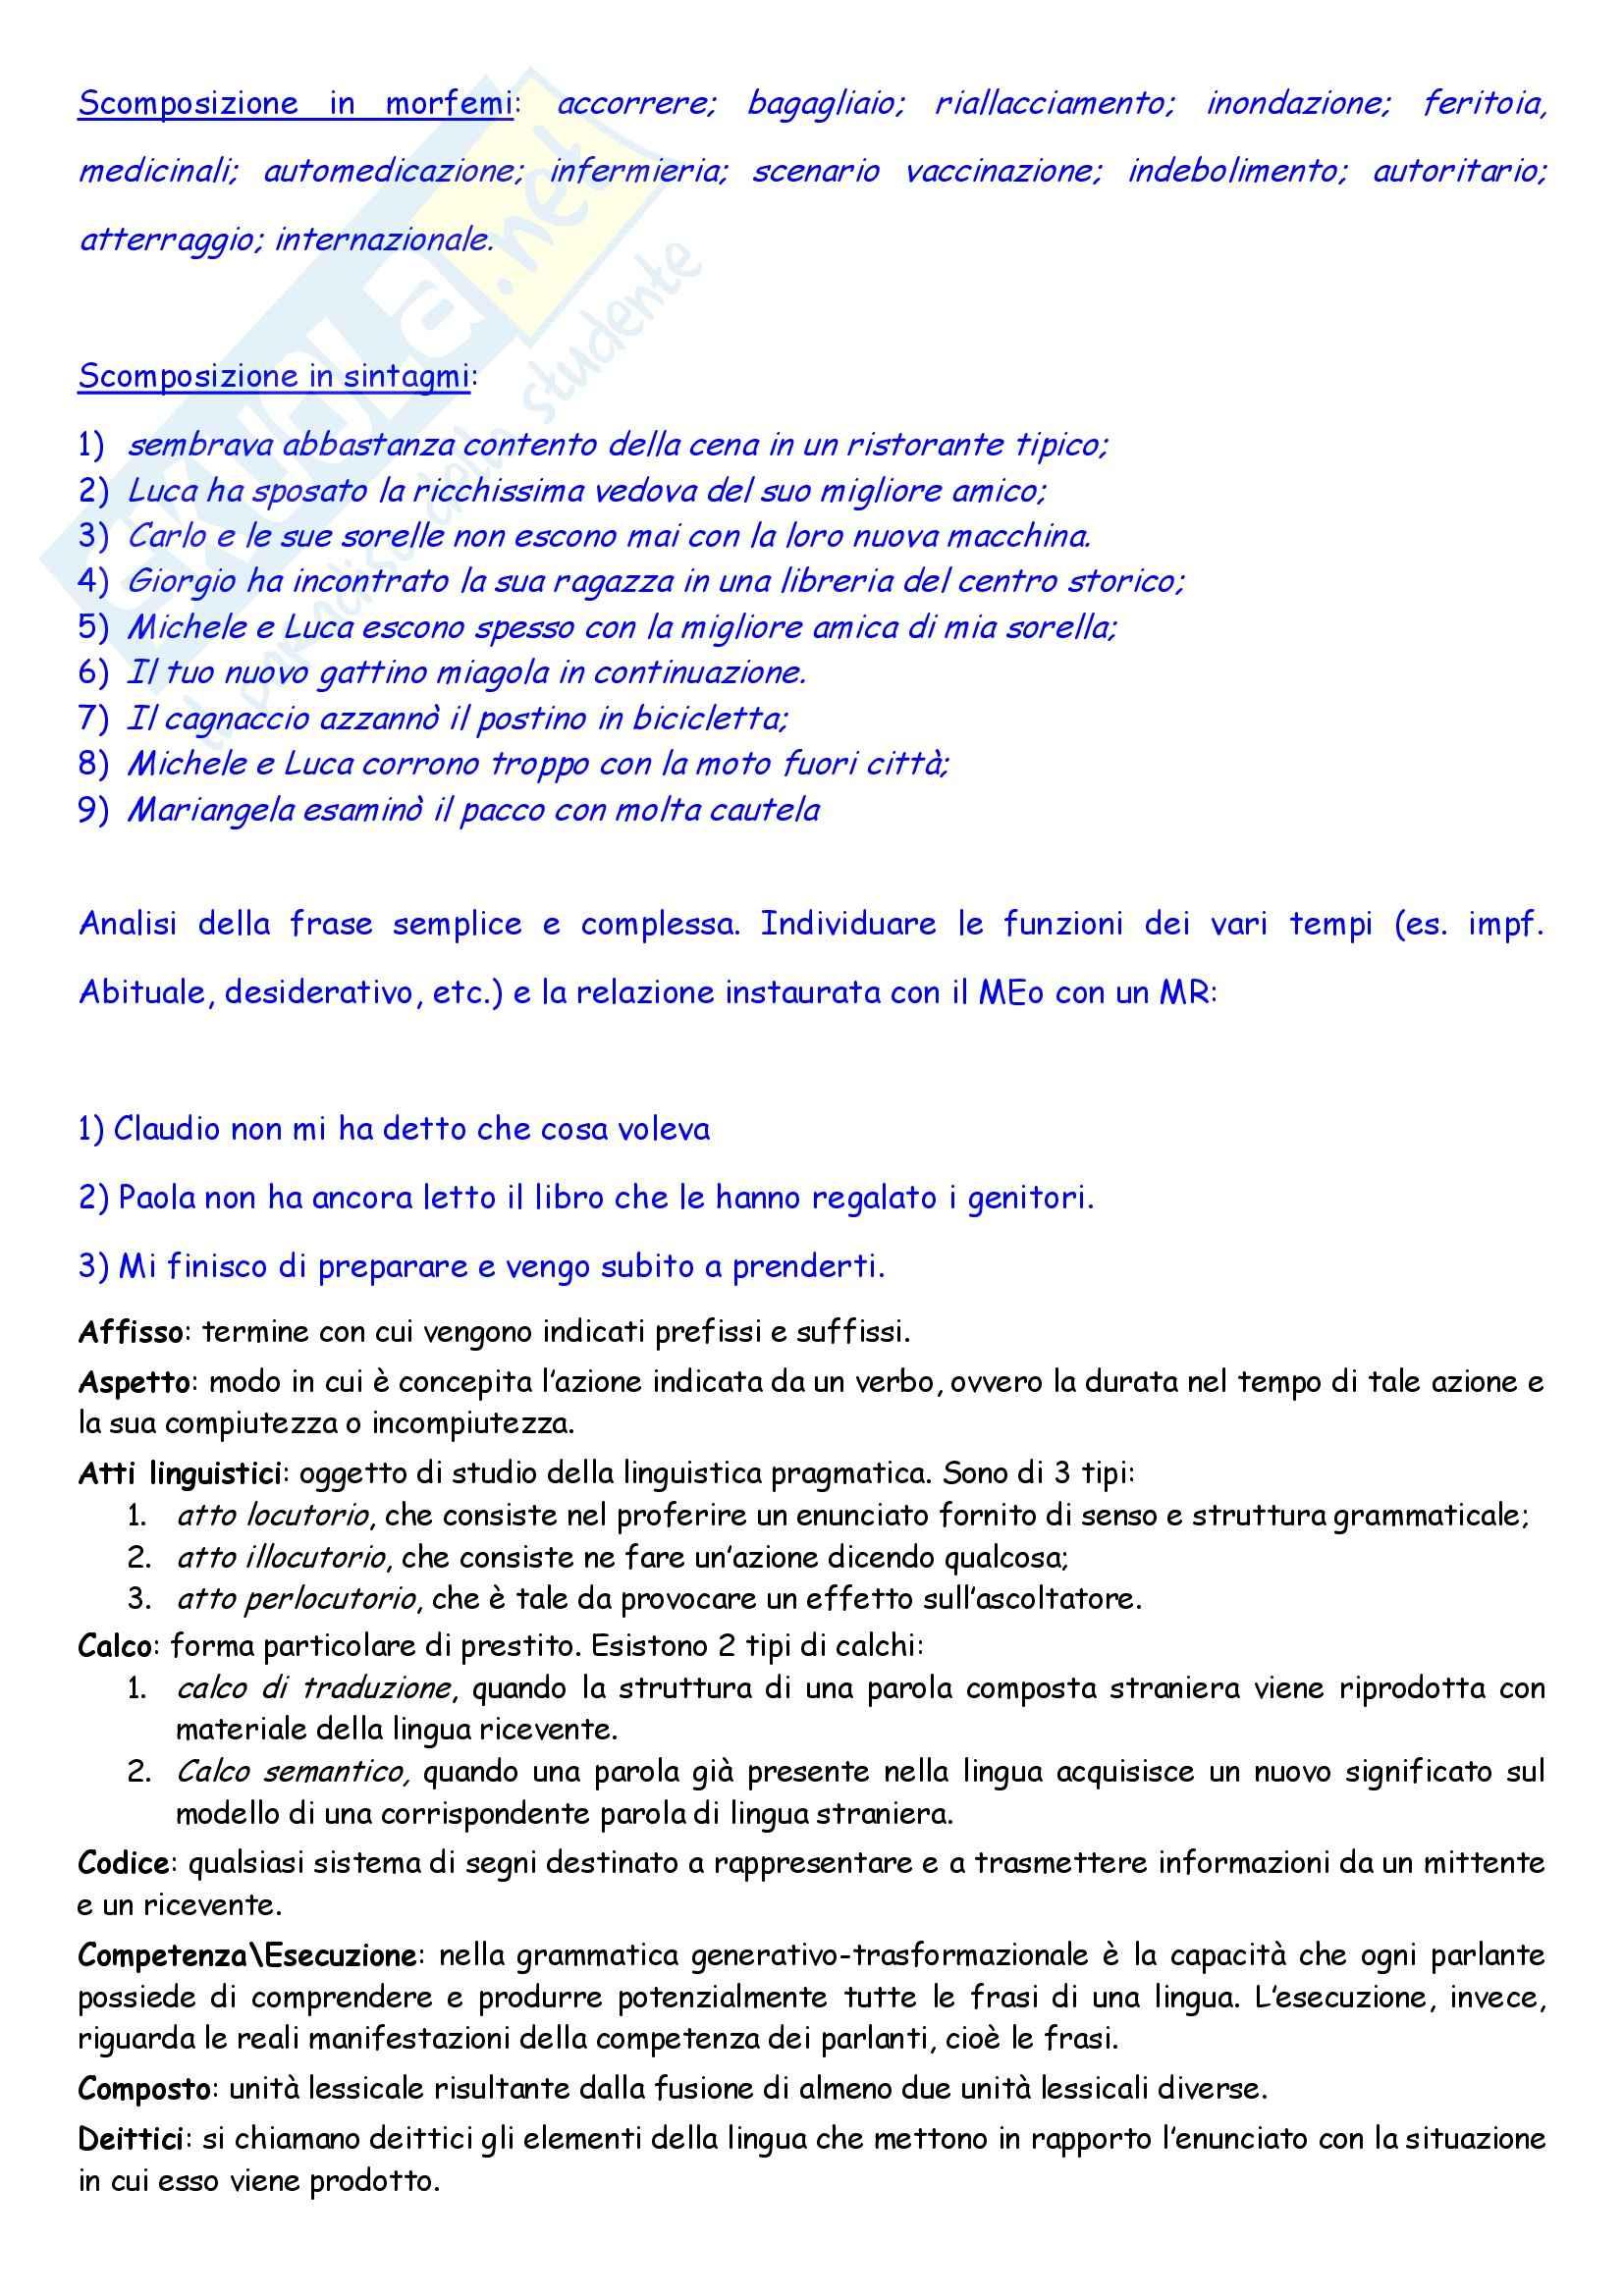 Linguistica italiana - nozioni generali